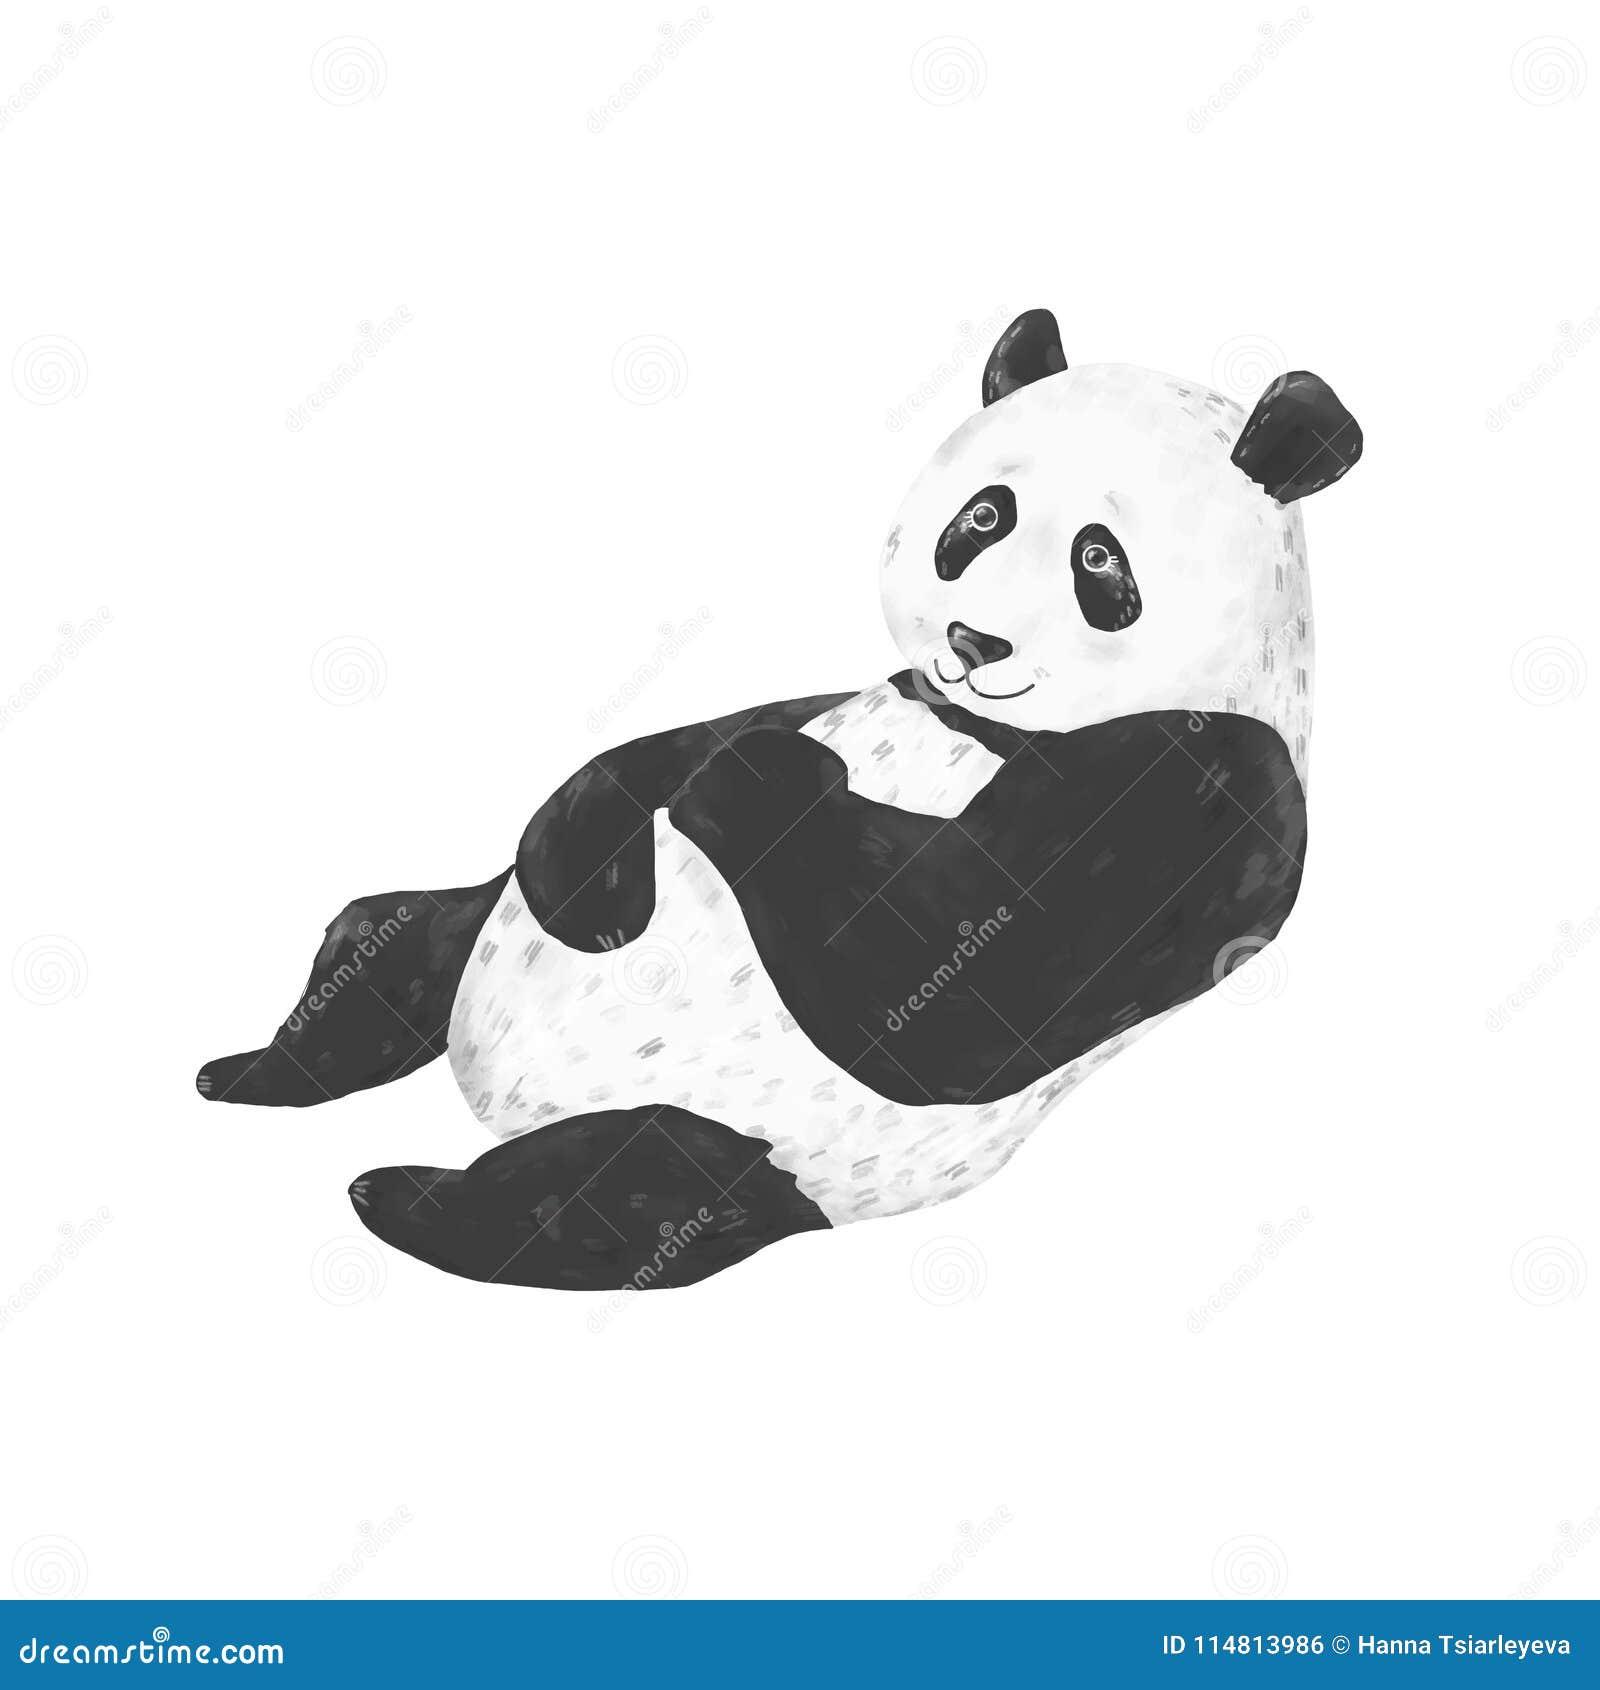 Panda Clip Art Drawing Animal Illustration On White Background Cute